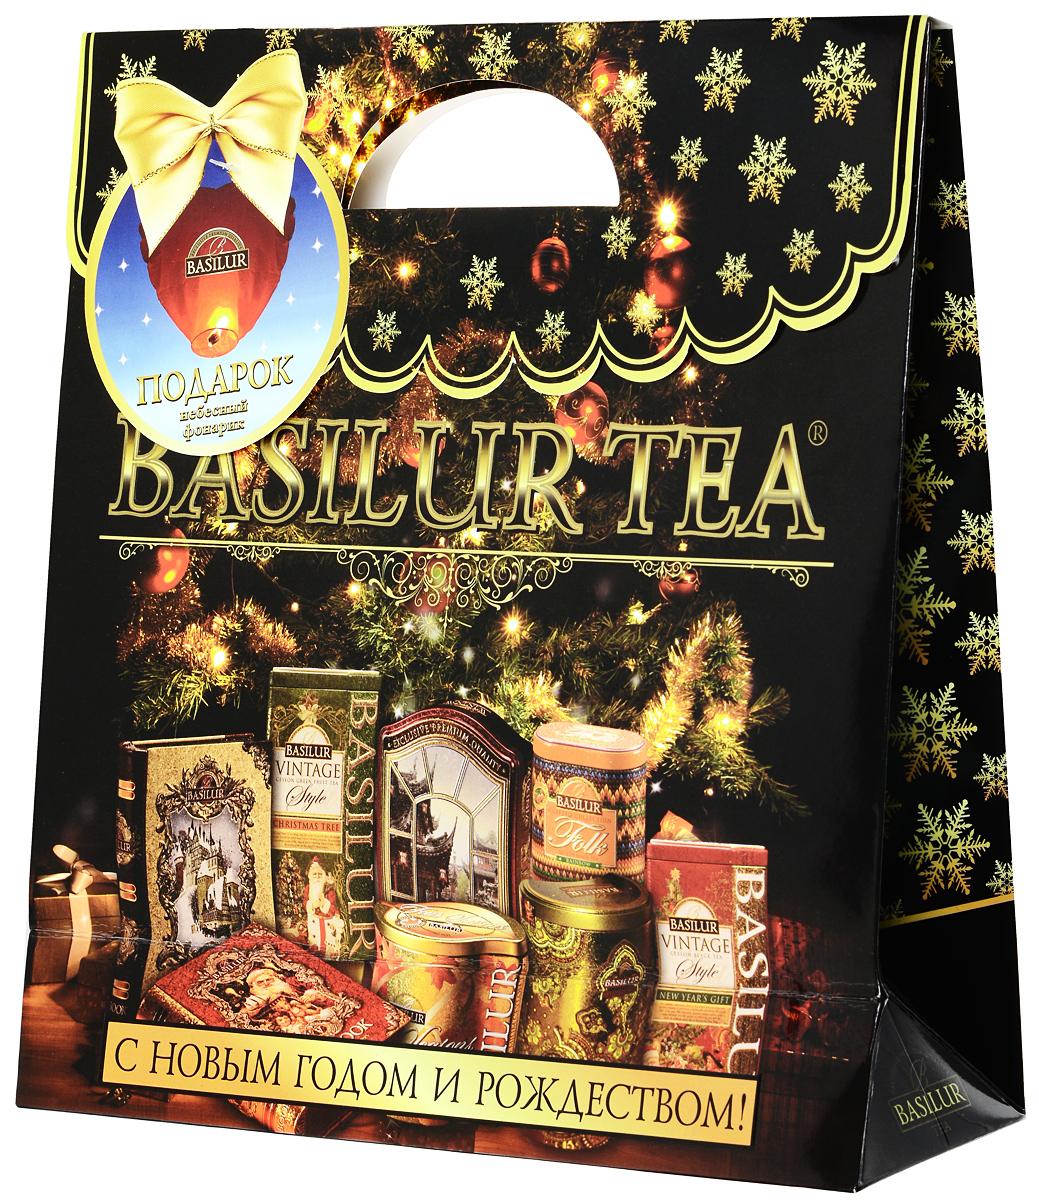 Новогодний чай basilur